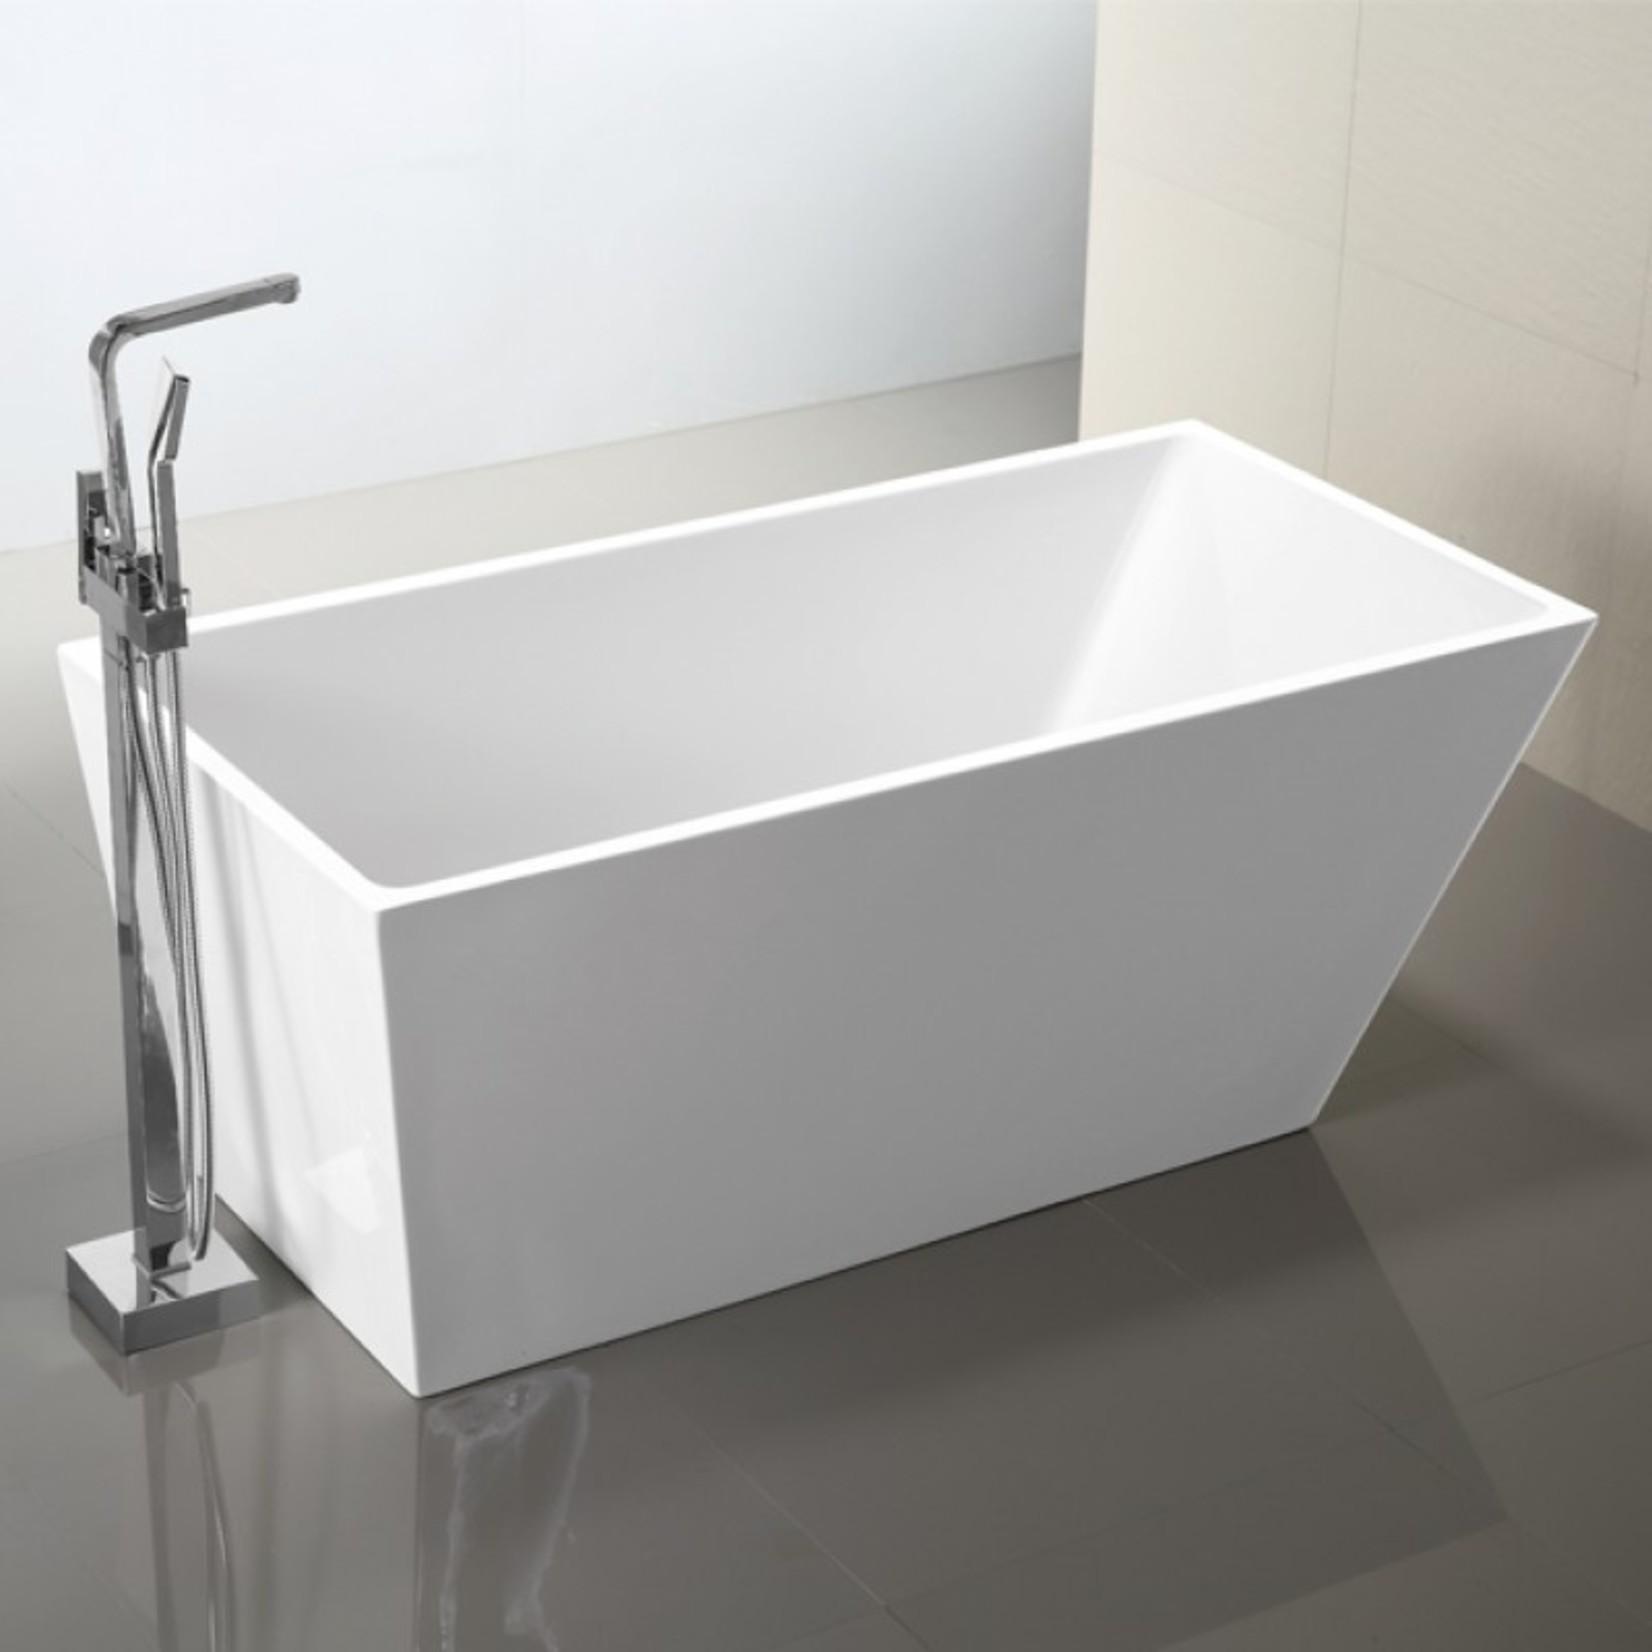 Deluxe Freestanding Bathtub Dawson-59